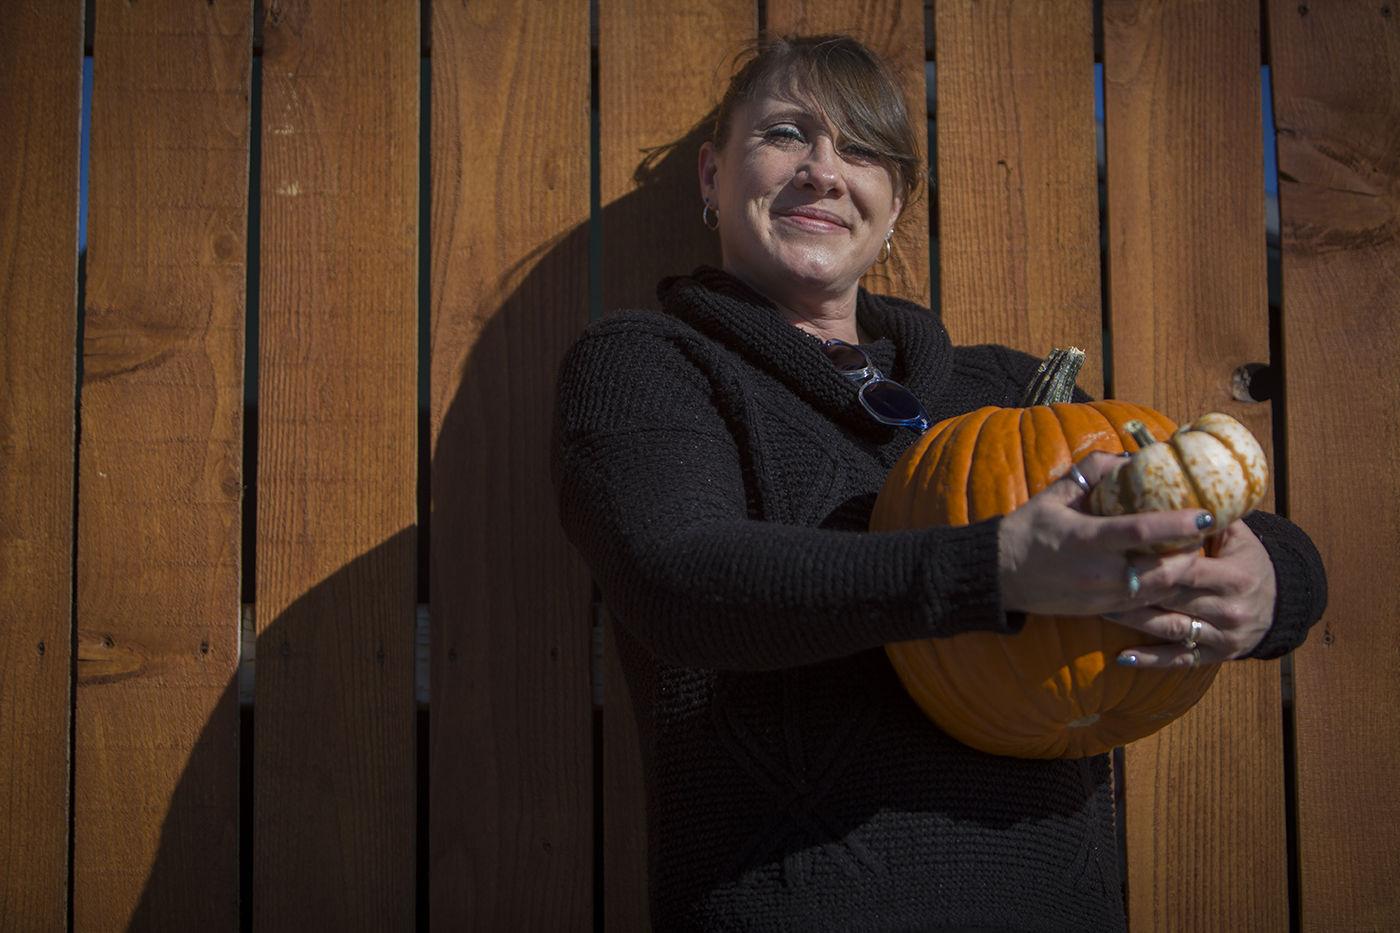 Corpus Christi church to host local pumpkin patch